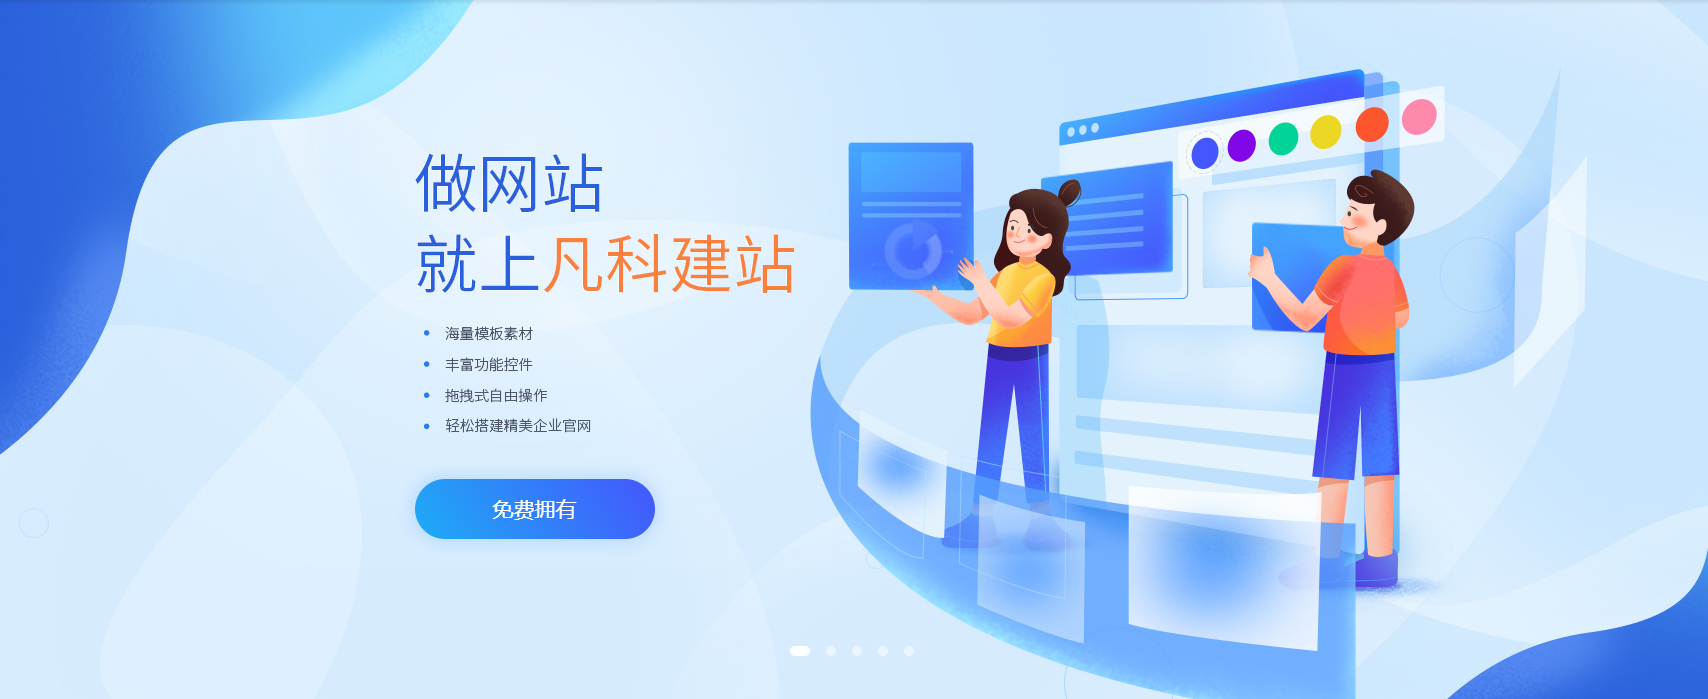 F布局网站设计